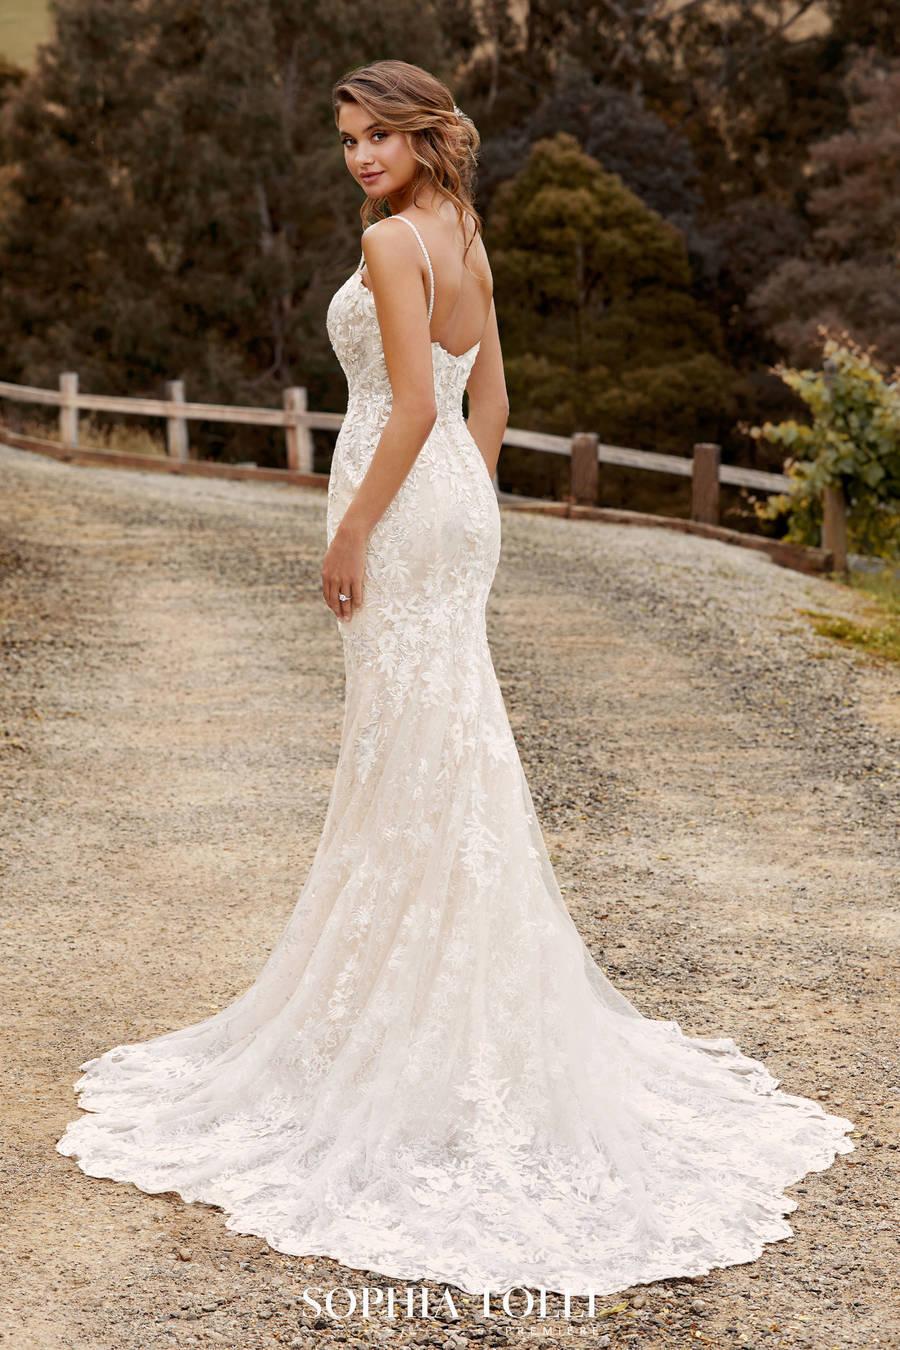 Mon Cheri Style Y22068 wedding dress